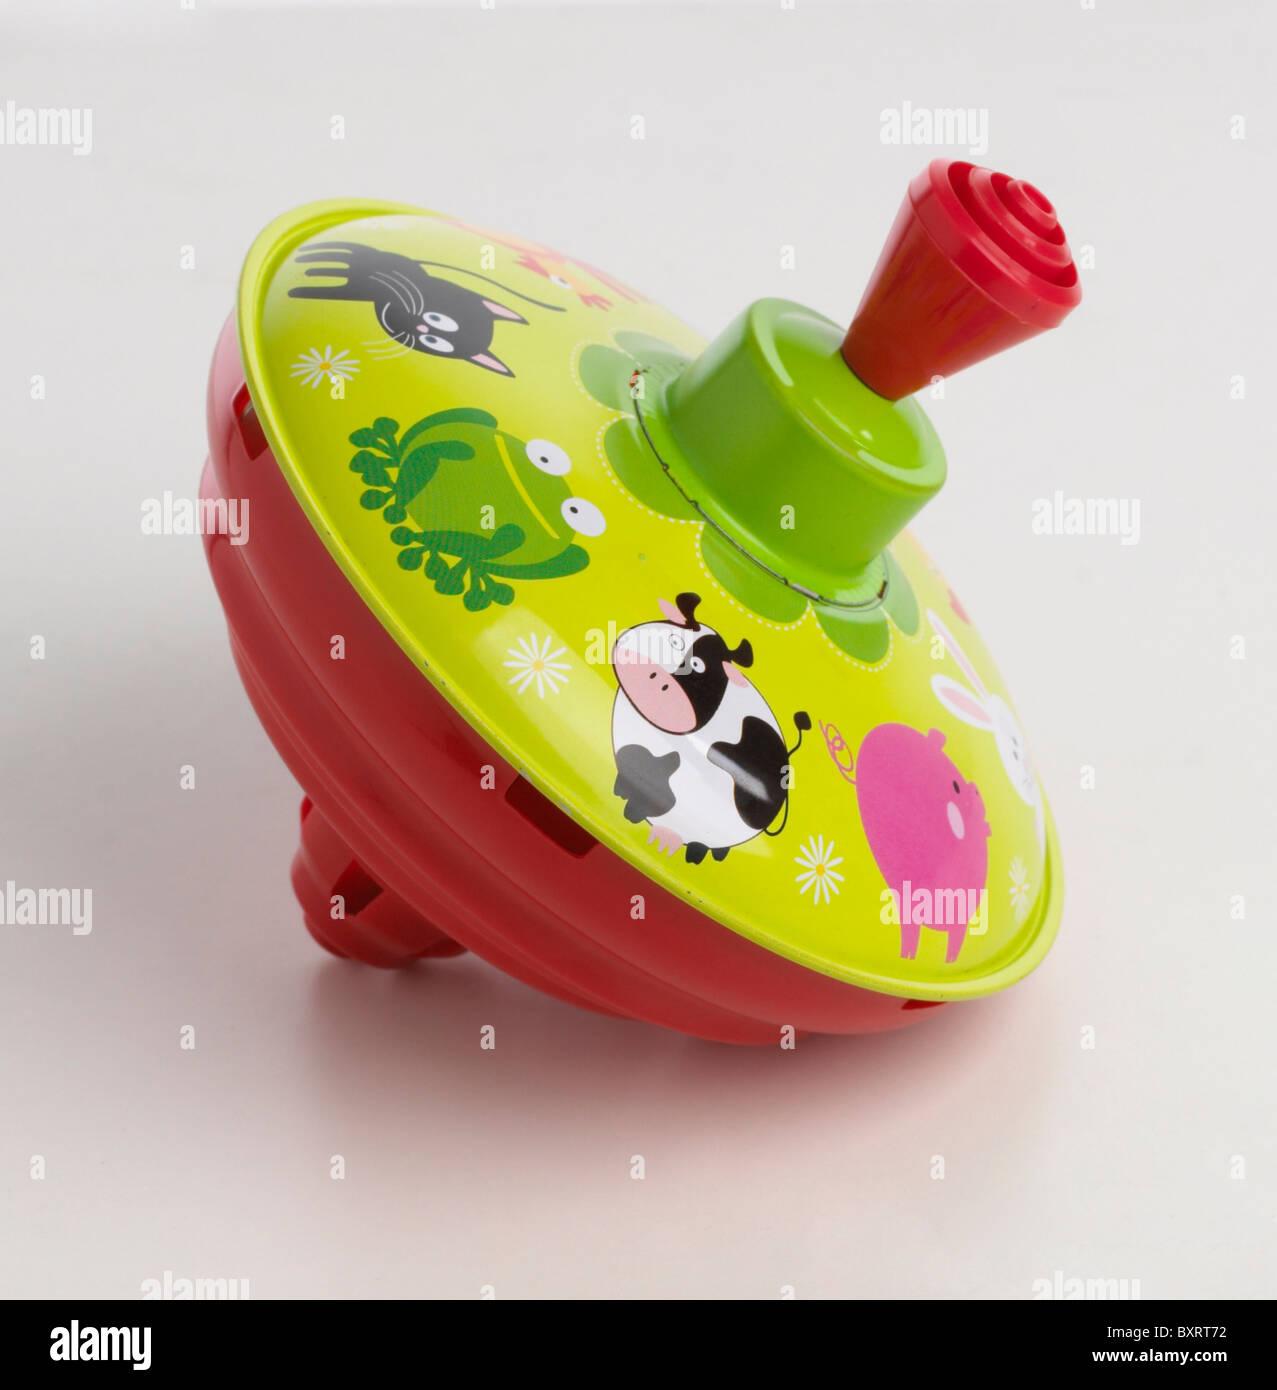 Spinning Top Kinderspielzeug Stockbild